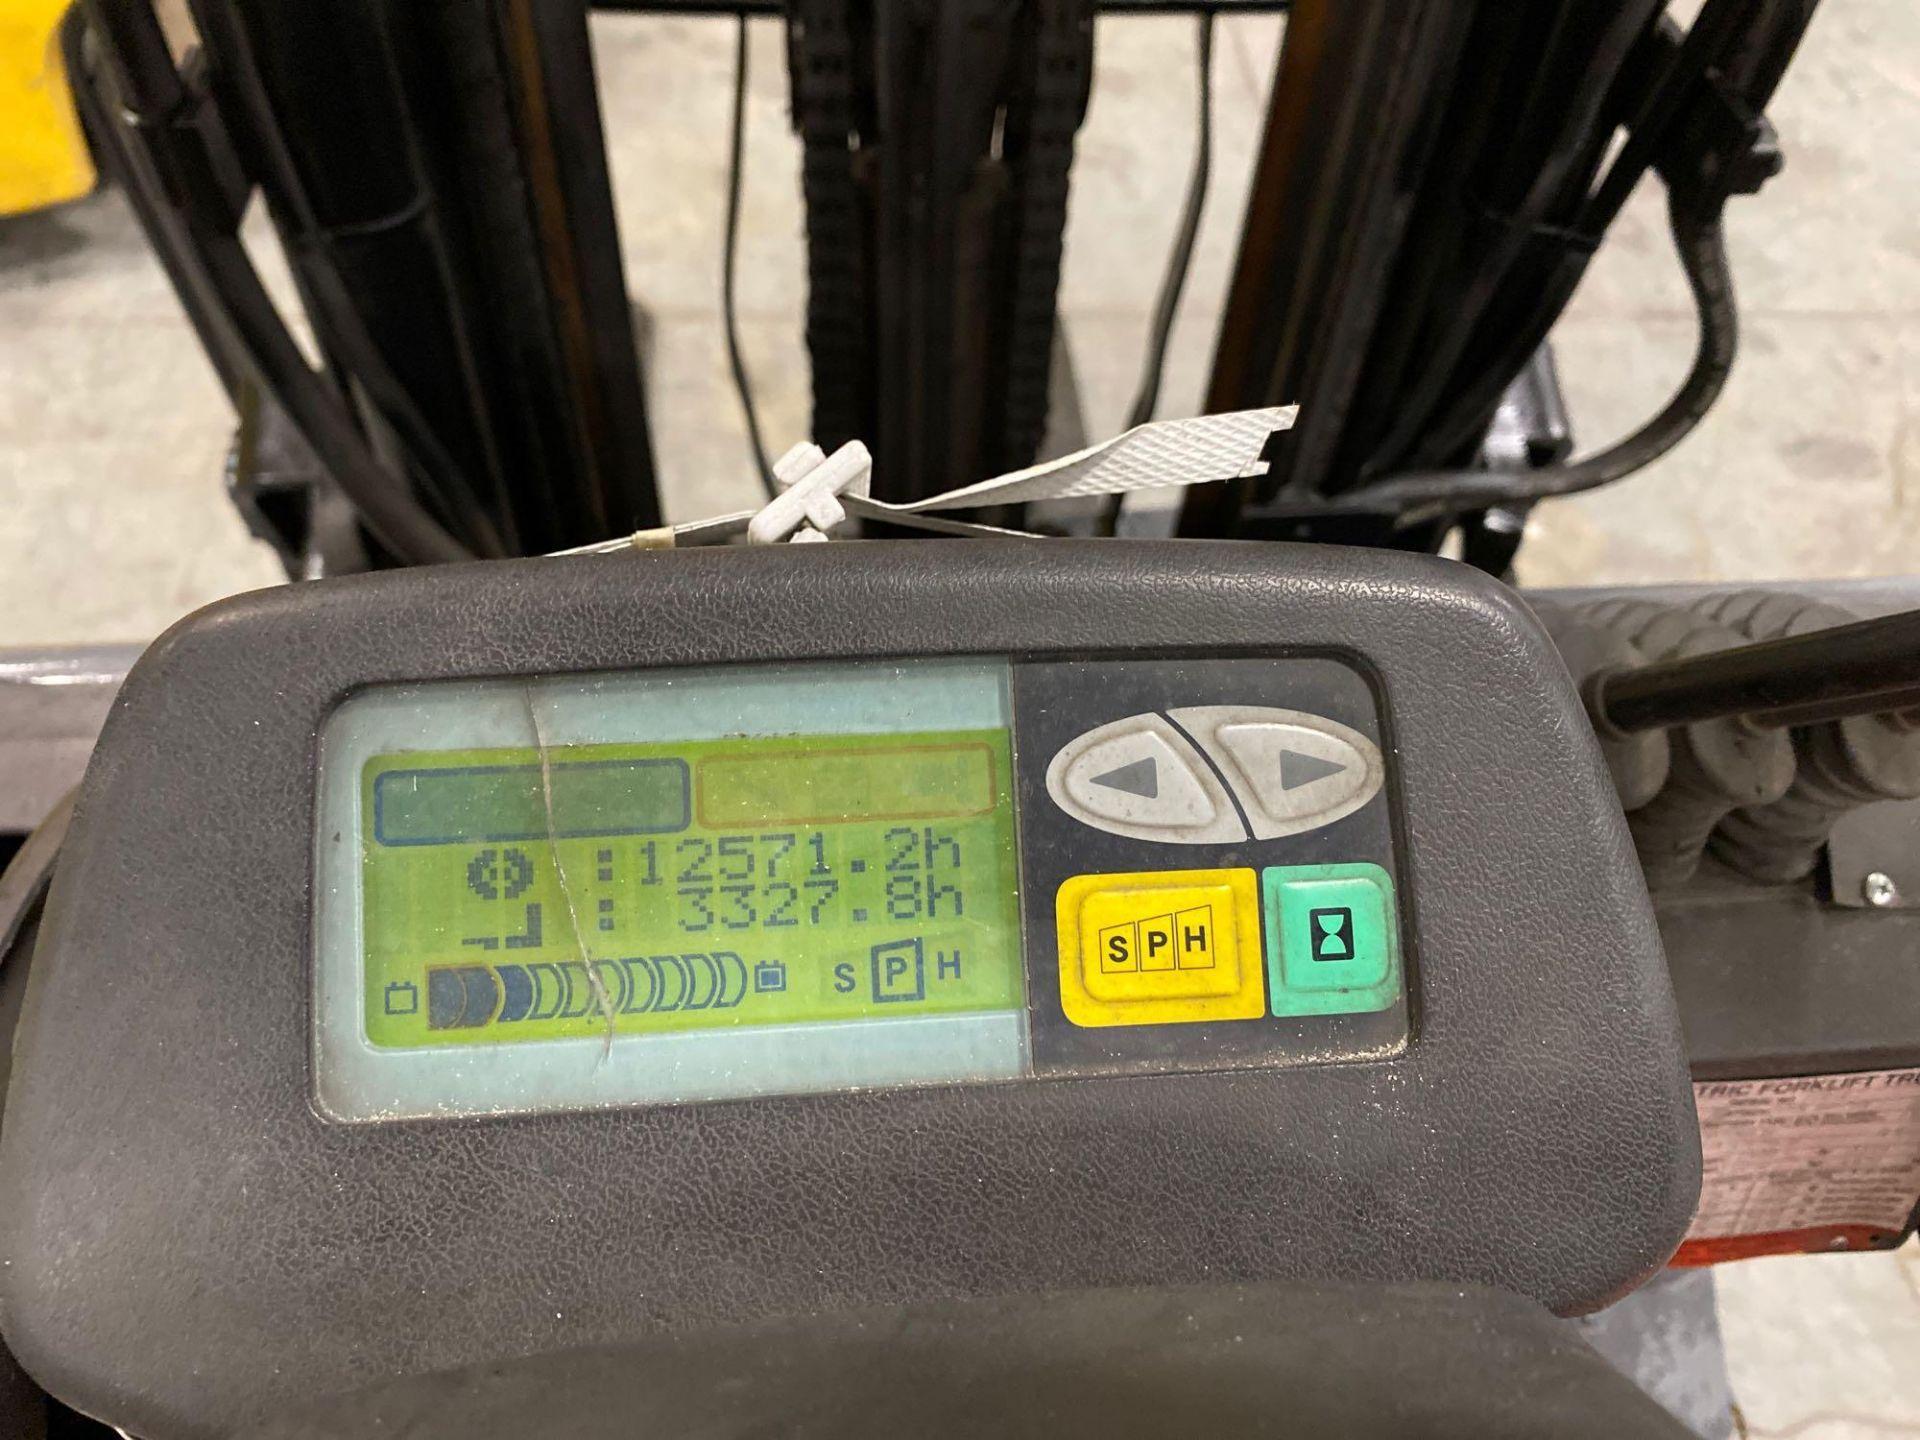 "TOYOTA 7FBCU25 ELECTRIC FORKLIFT, 5,000 LB CAPACITY, 170.5"" HEIGHT CAPACITY, TILT, SIDE SHIFT, 36V, - Image 17 of 22"